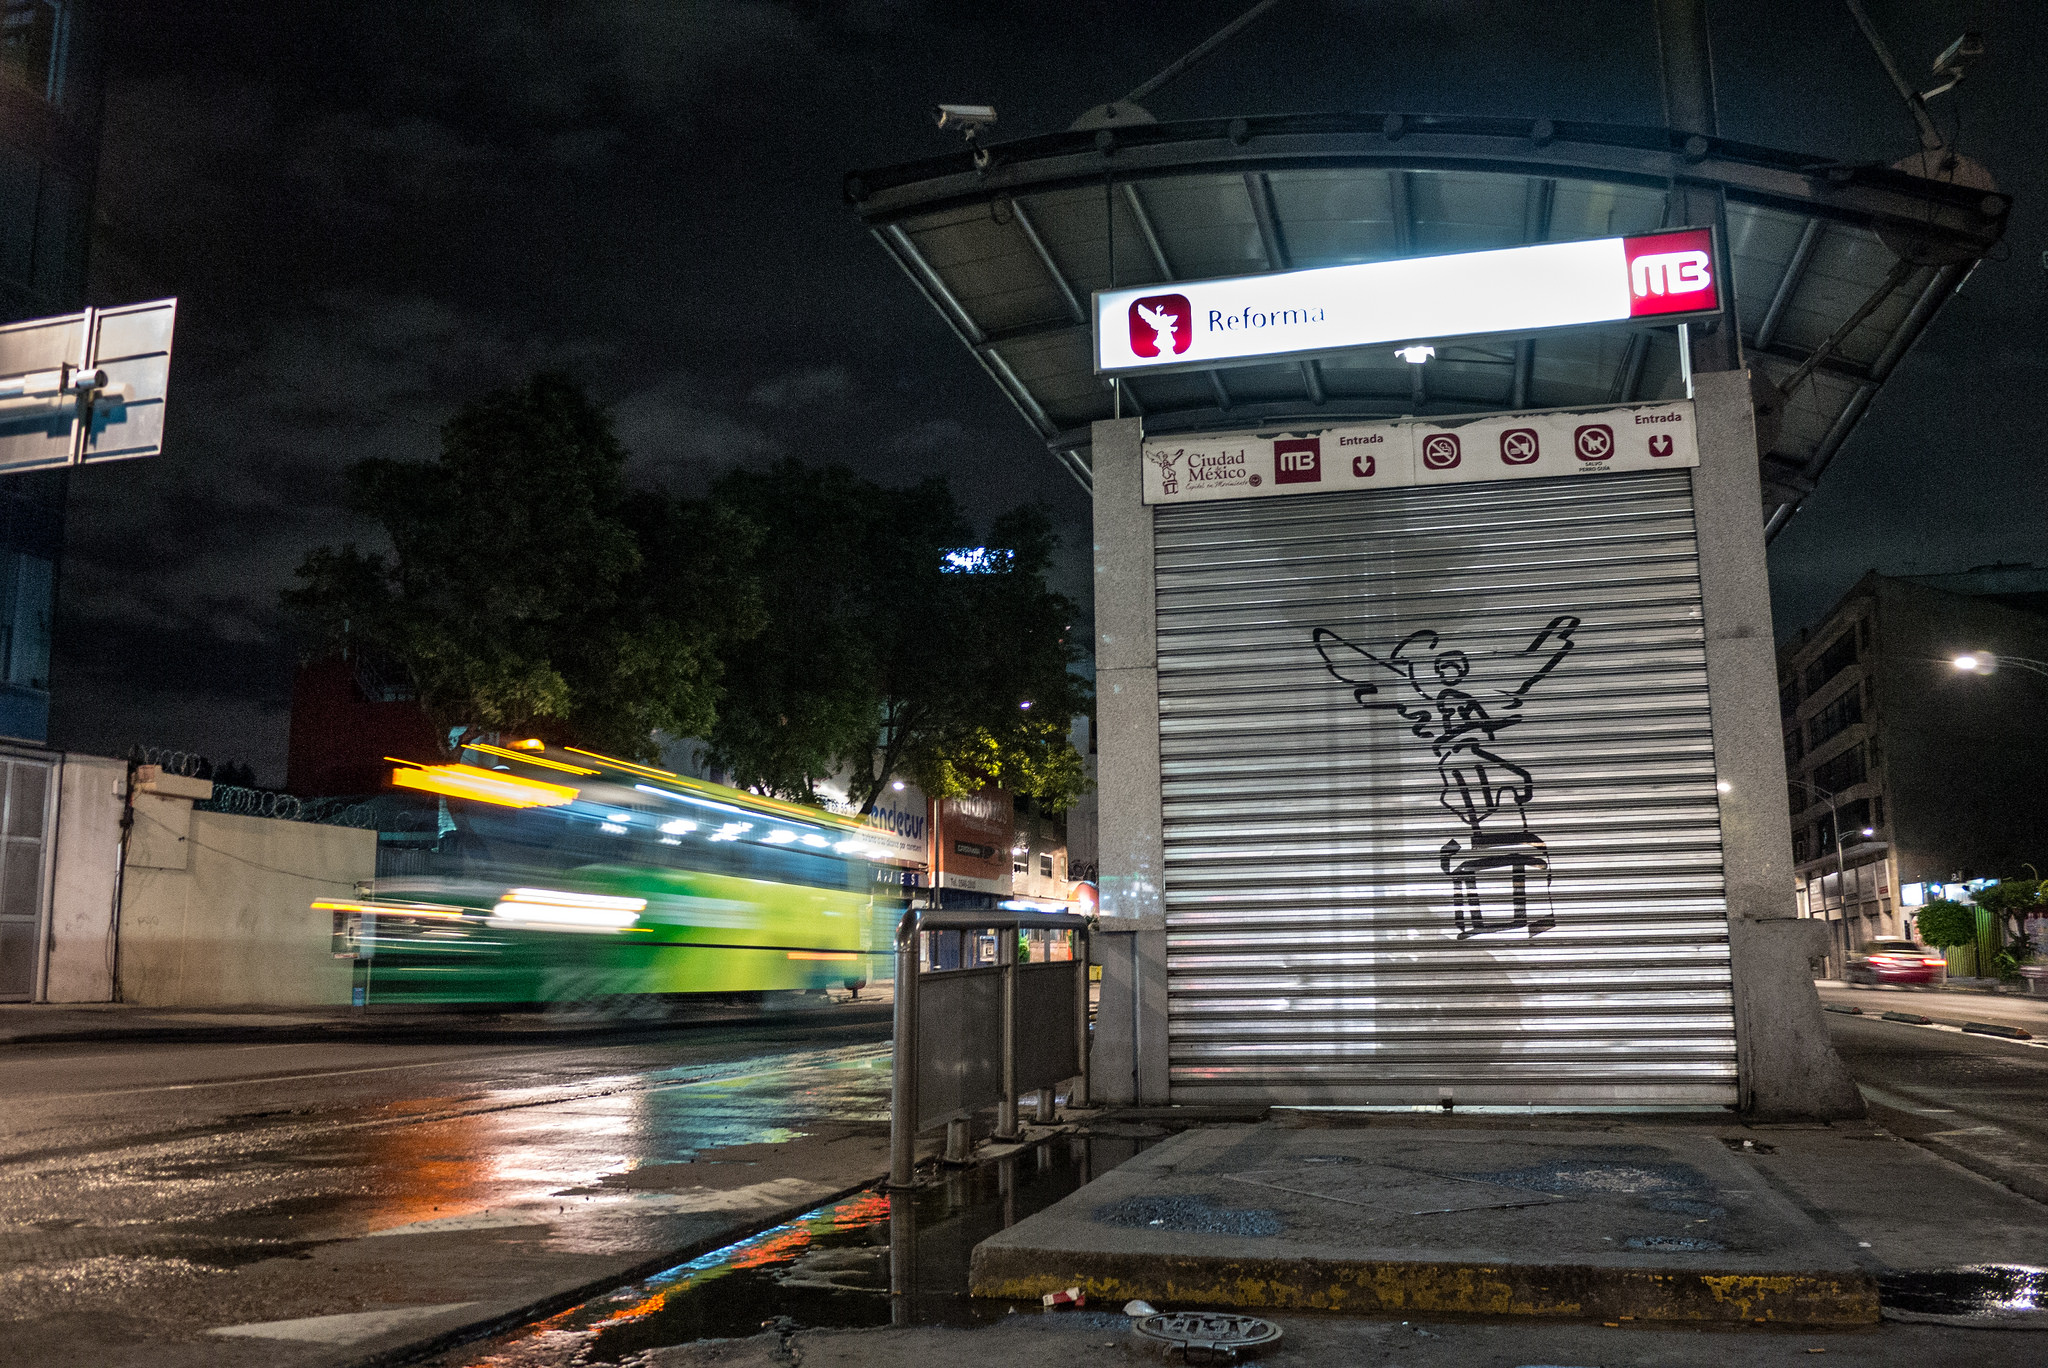 Avenida Reforma at night | © Eneas de Troya/Flickr